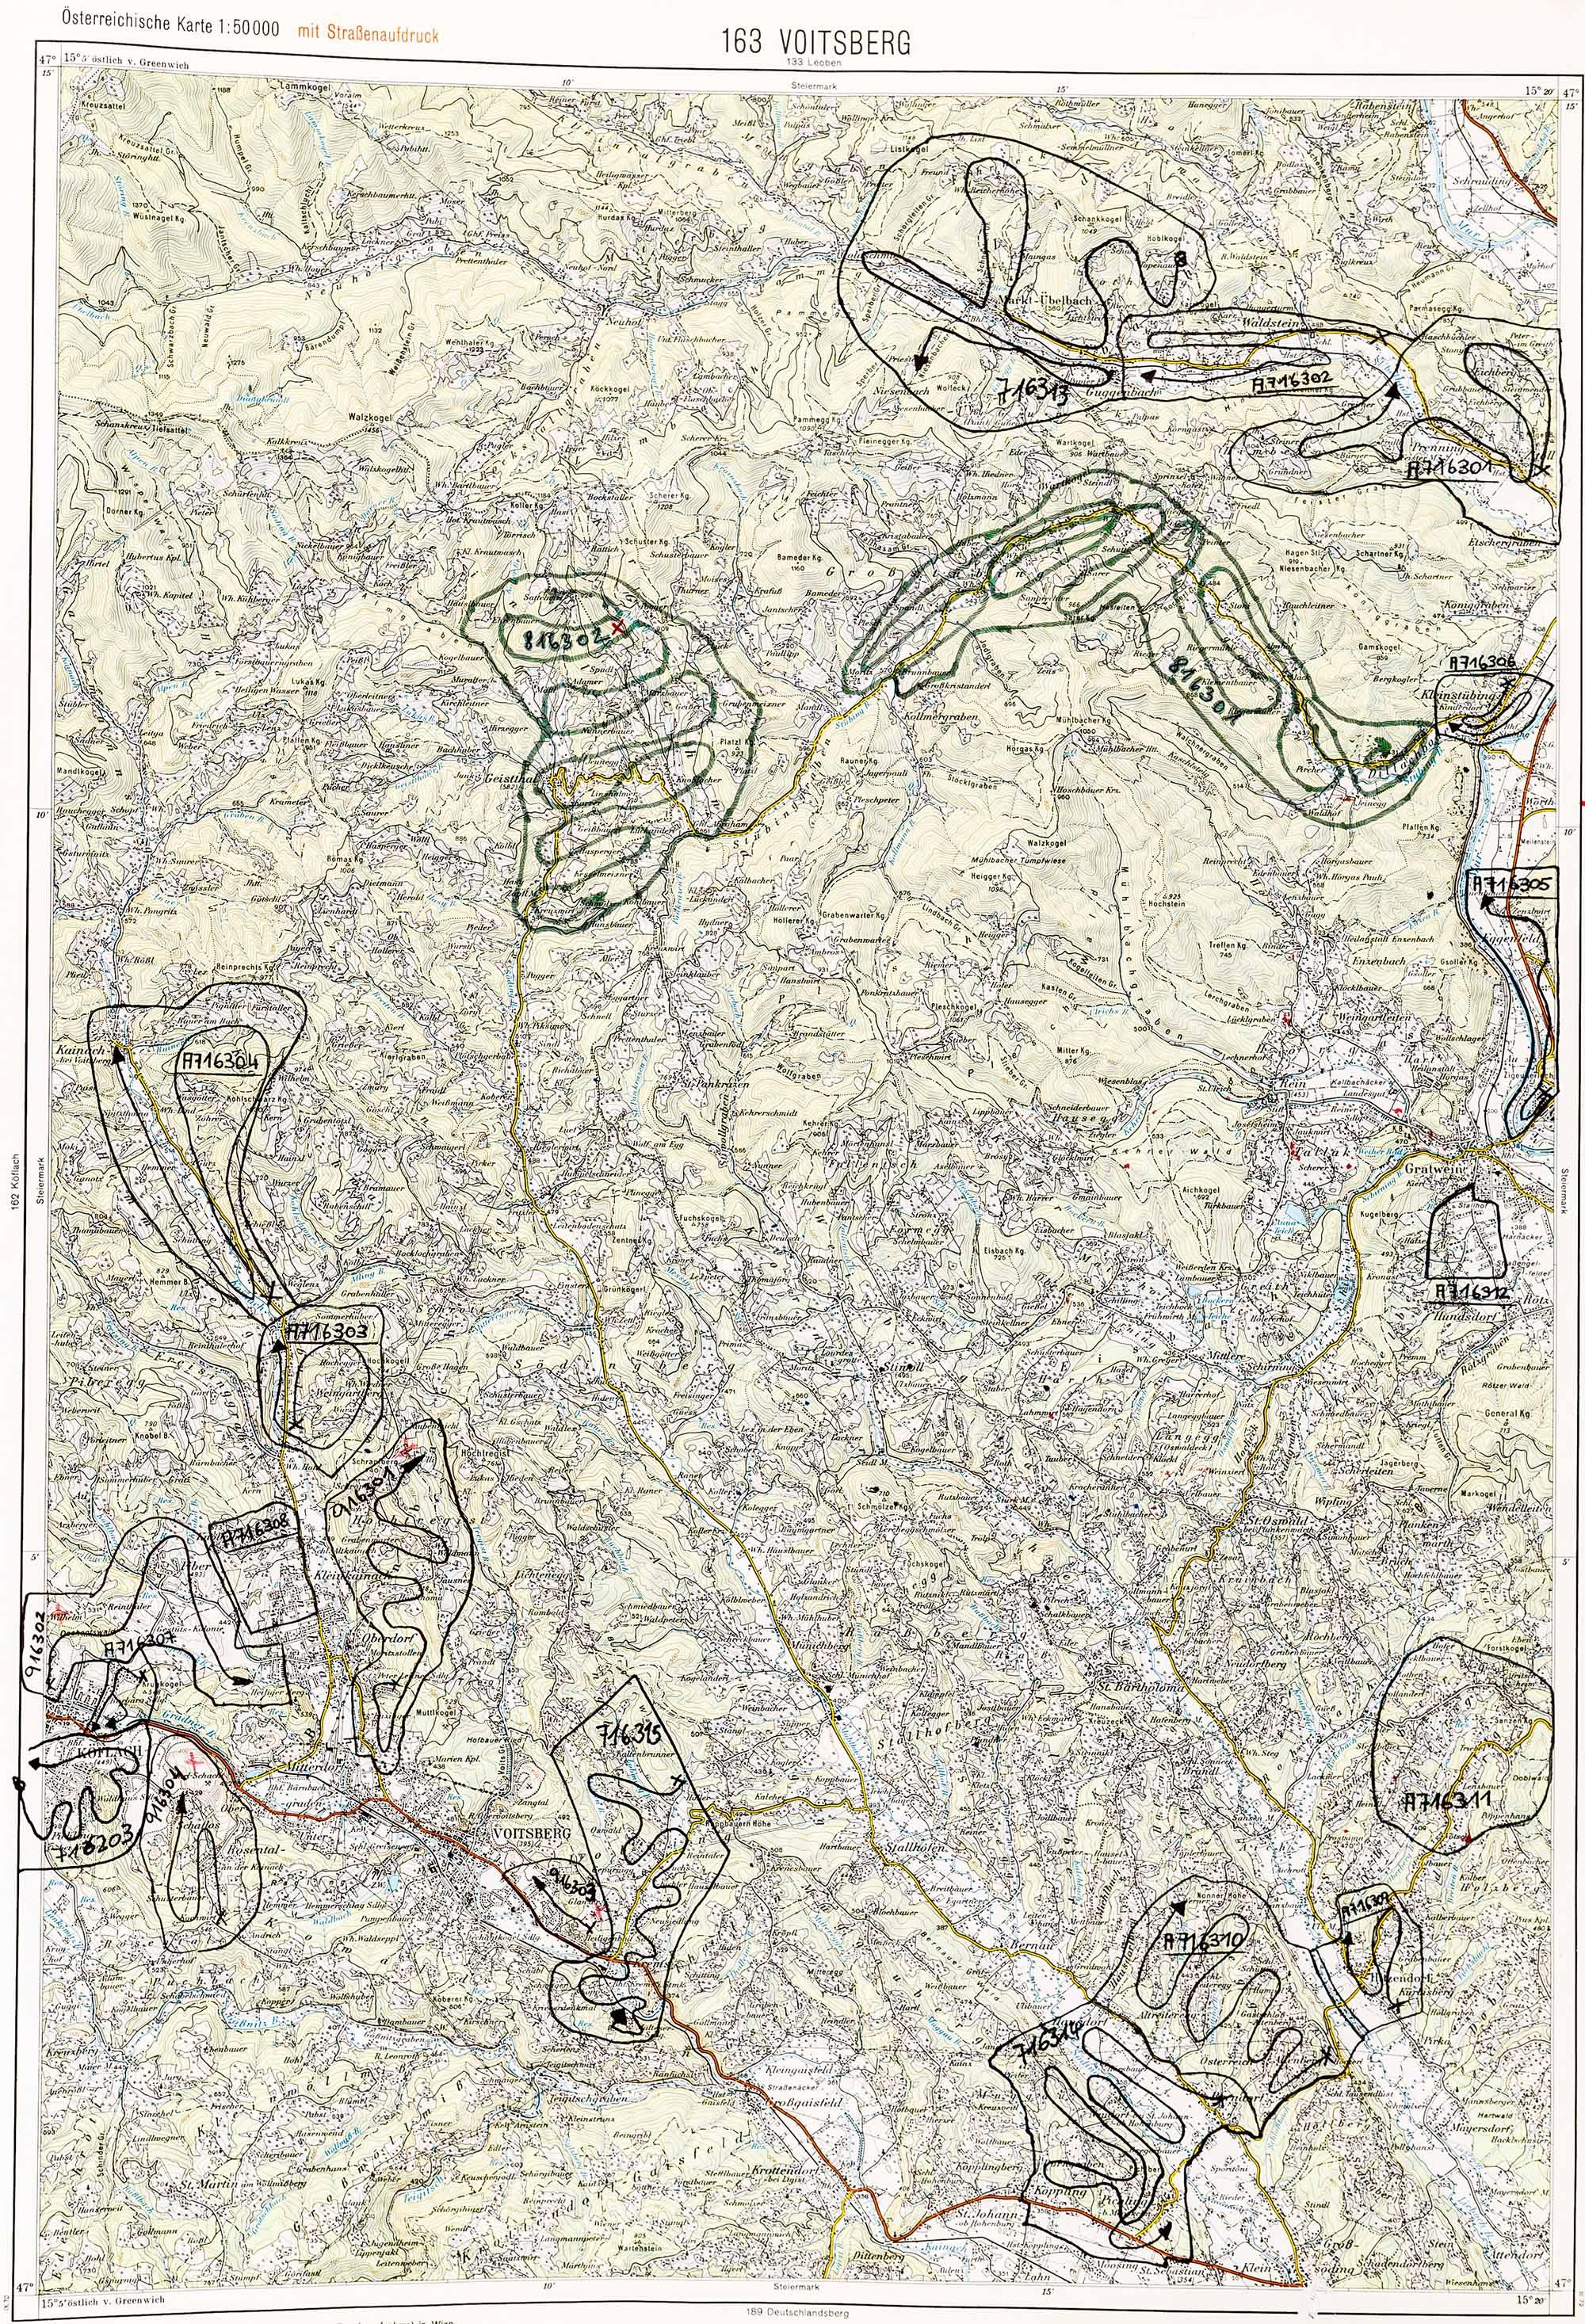 1975-1979 Karte 163